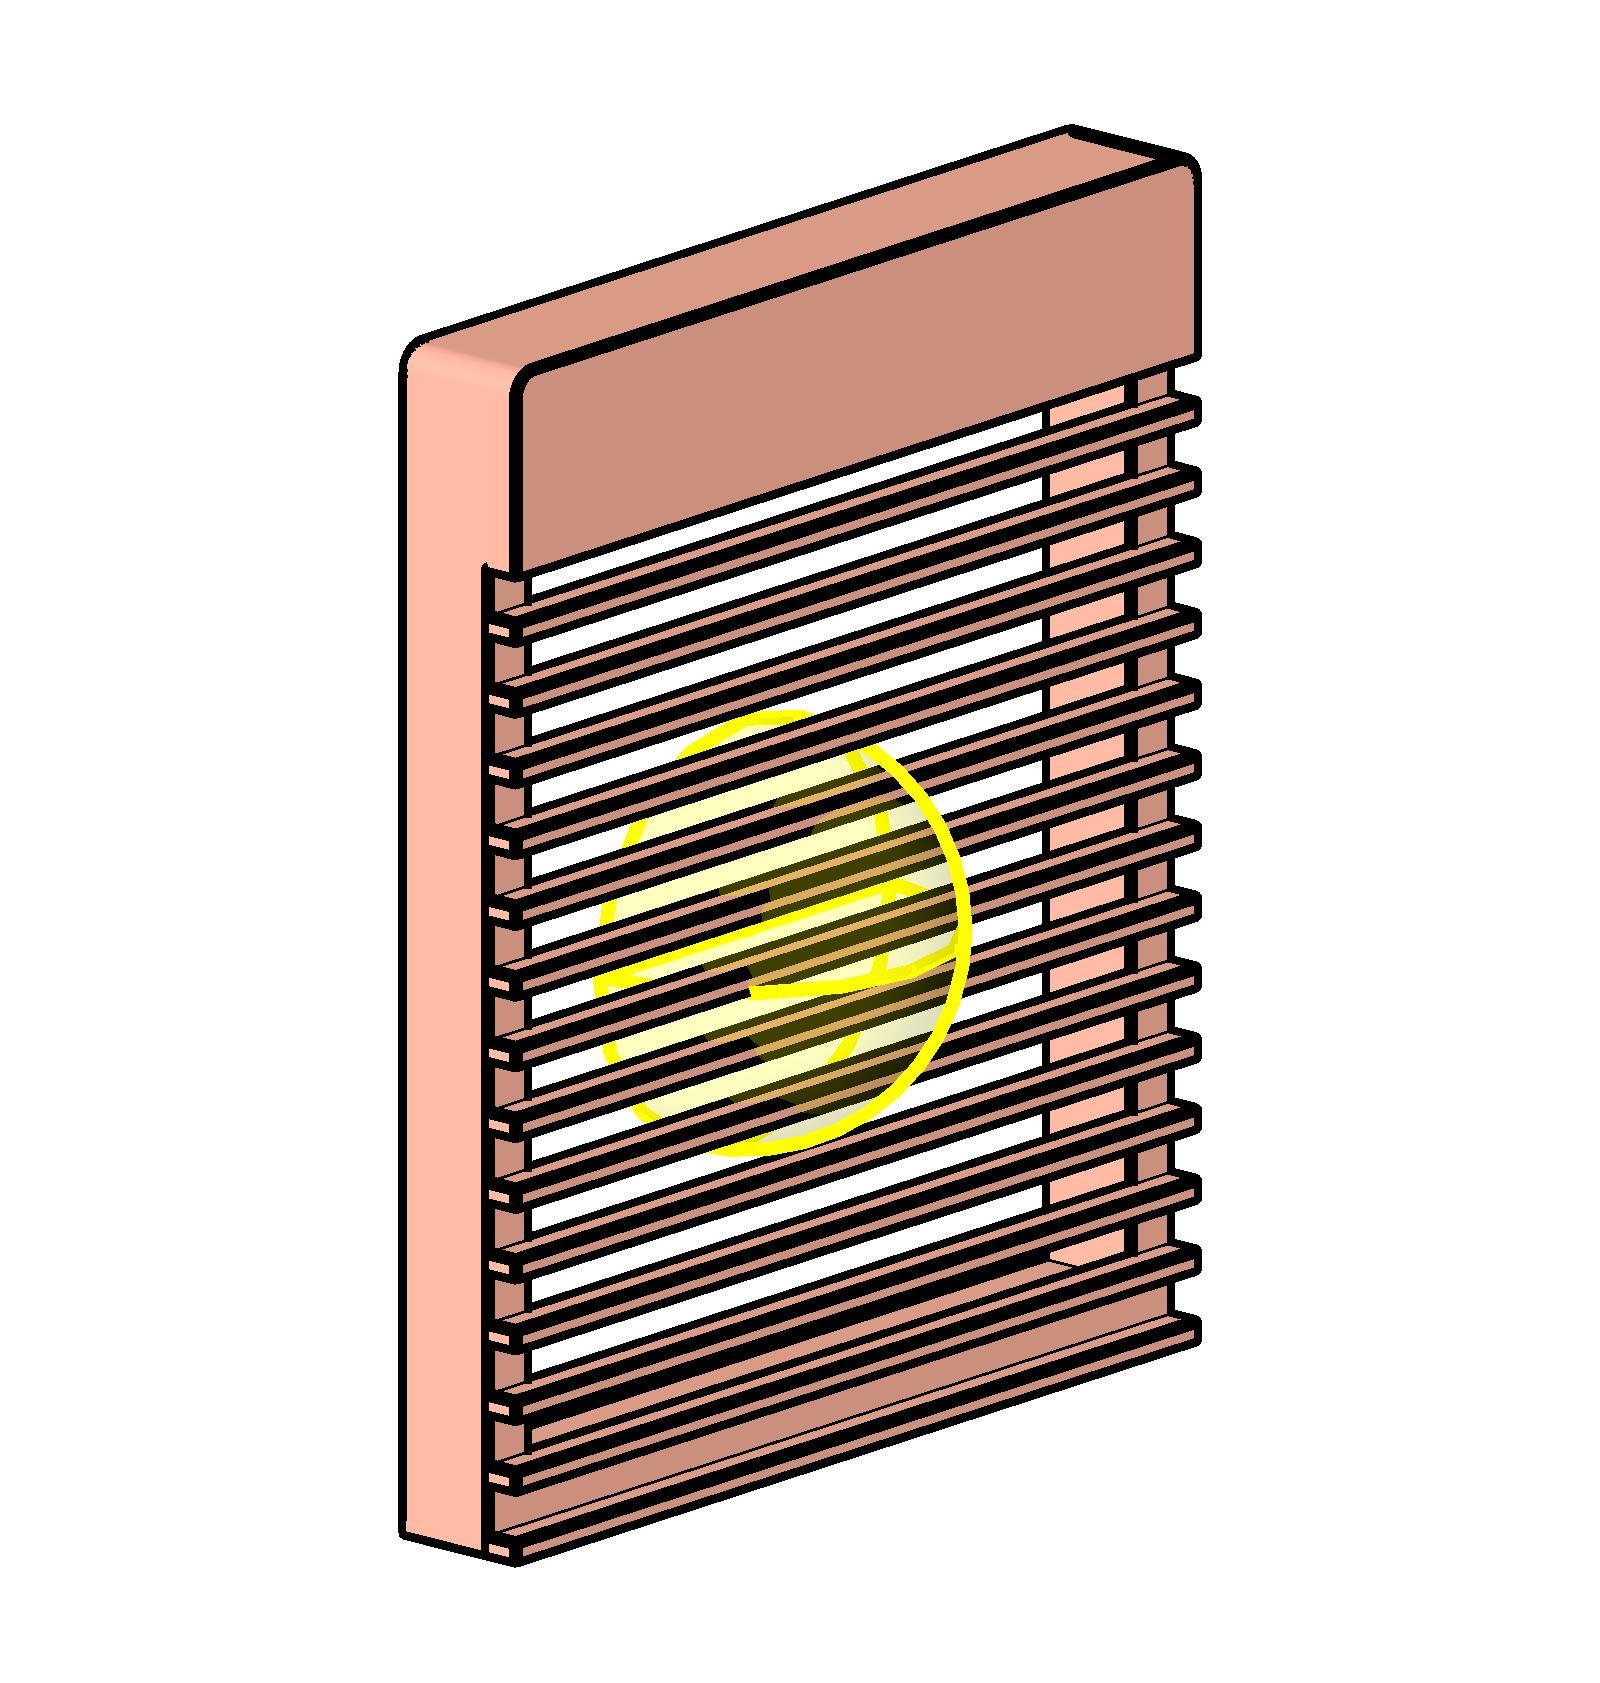 Outdoor Lights Revit: BIM Objects / Families